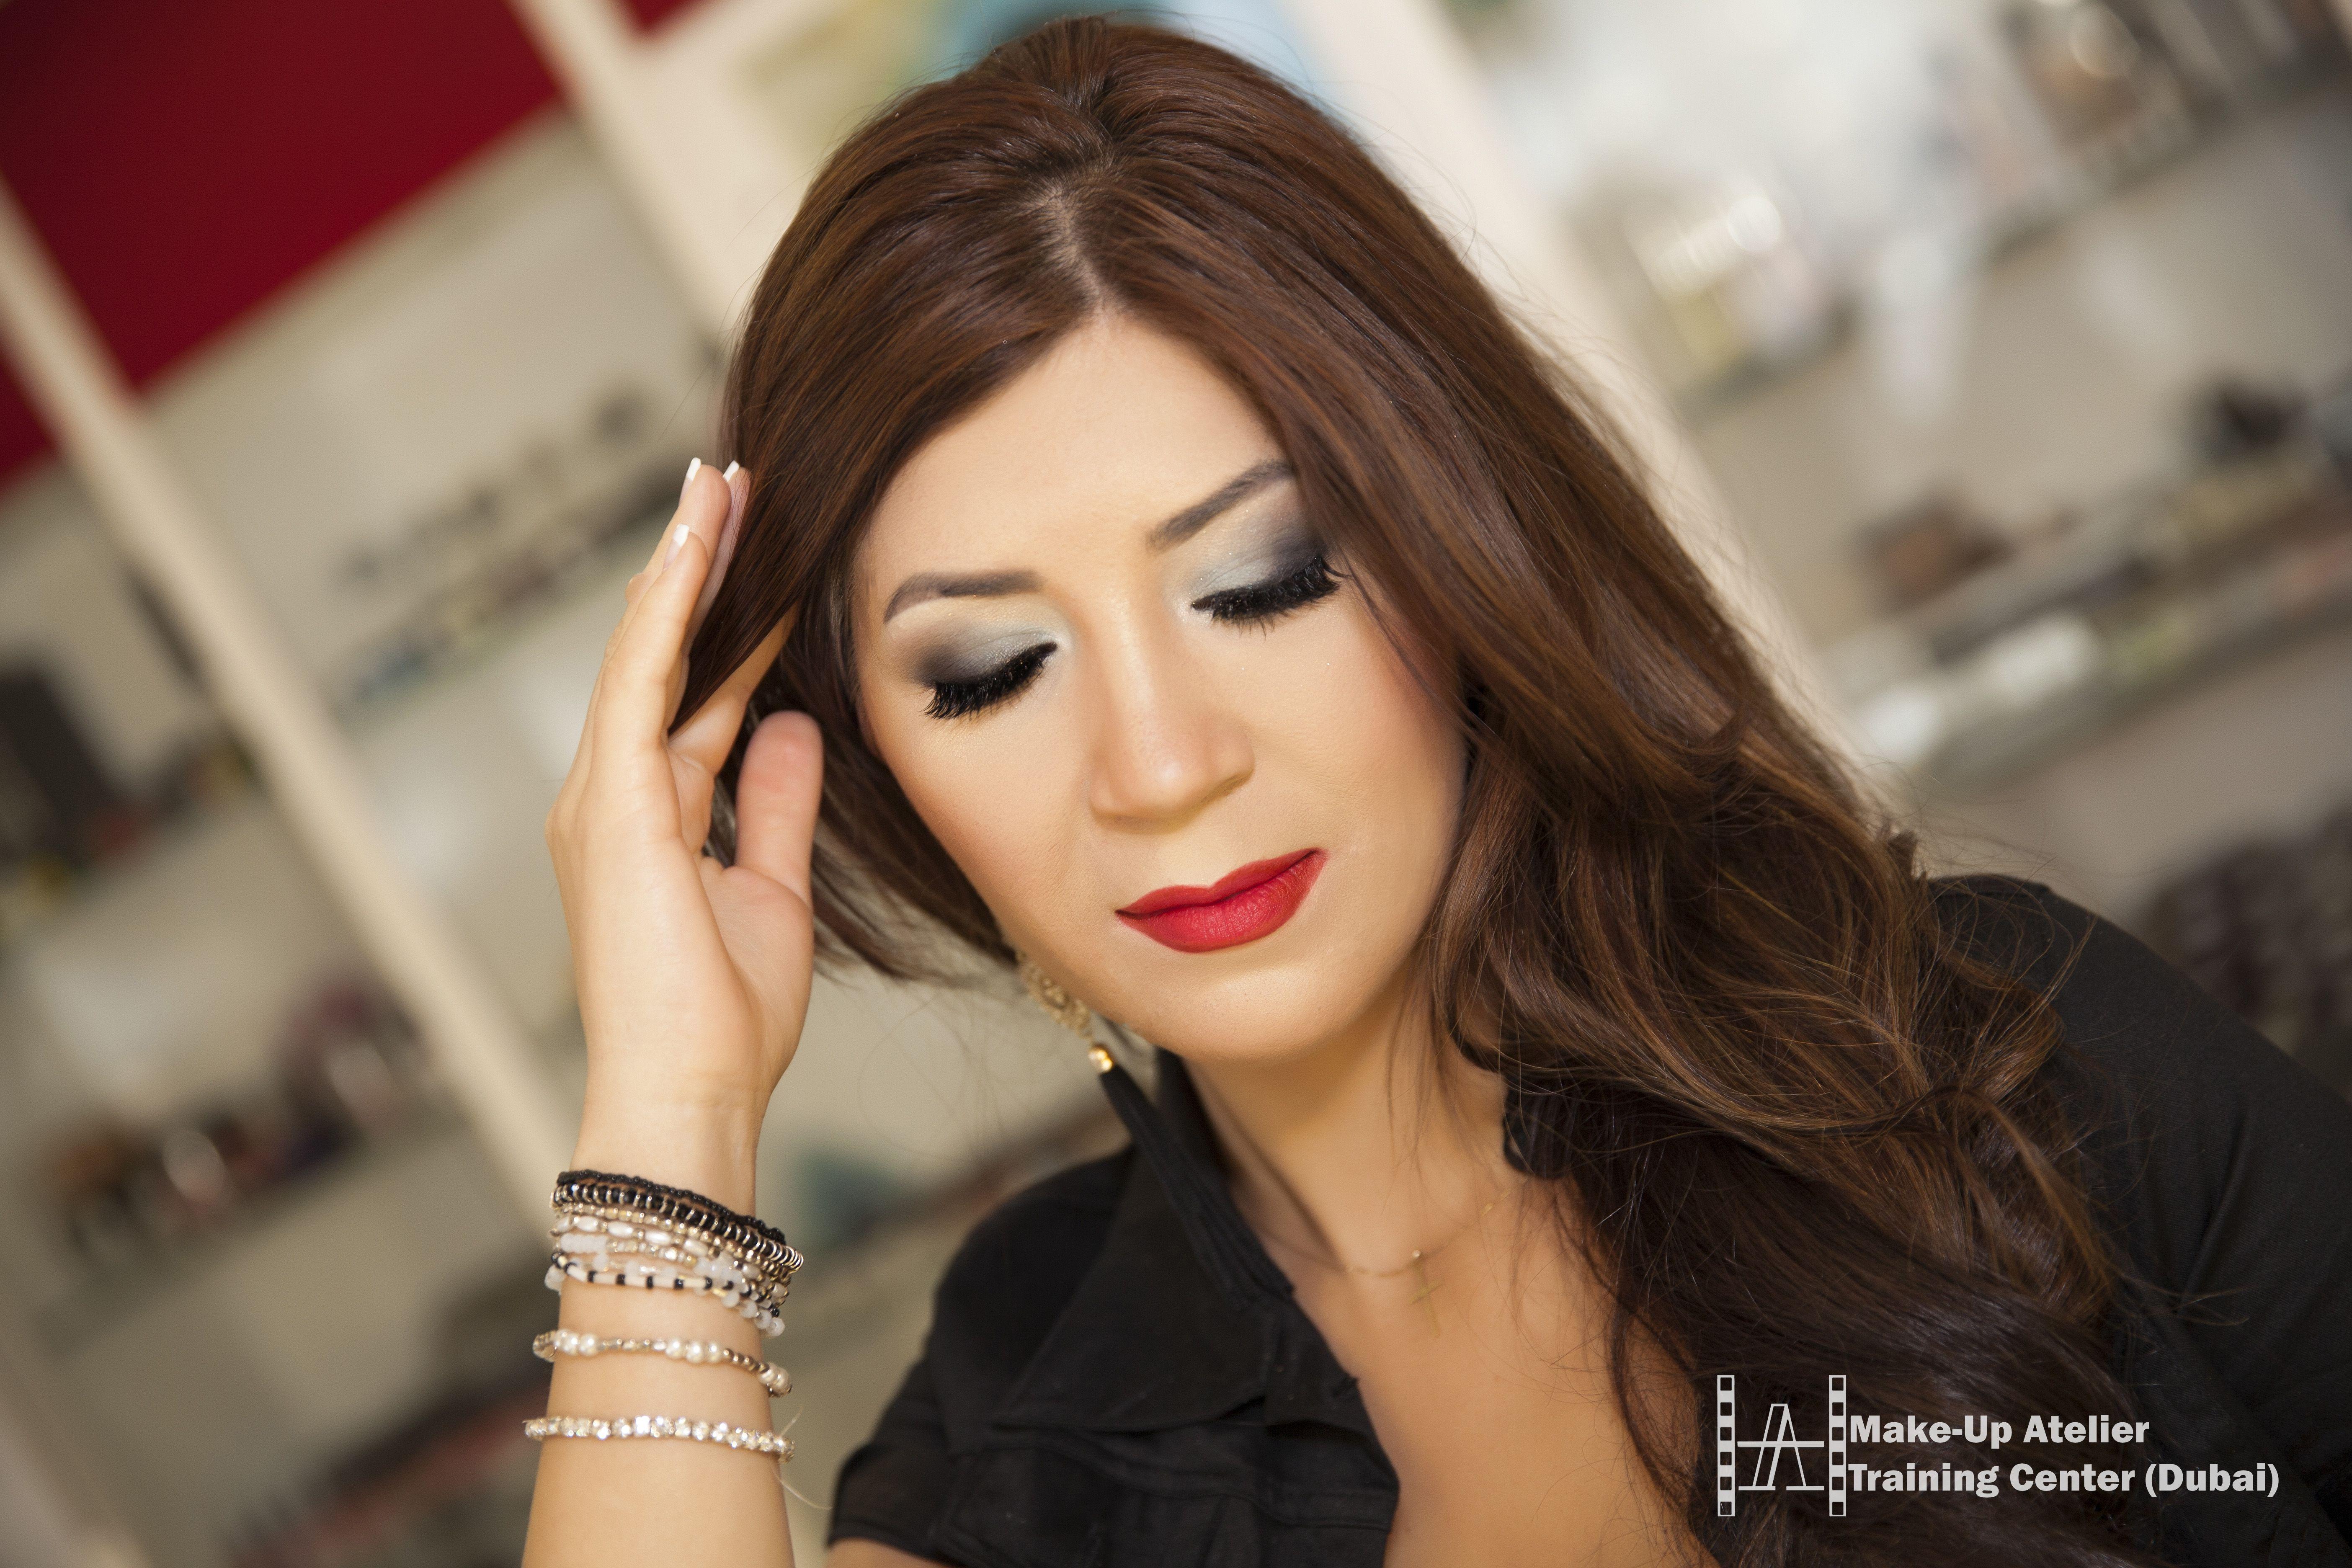 www.makeup.ae makeup courses dubai دورات الماكياج